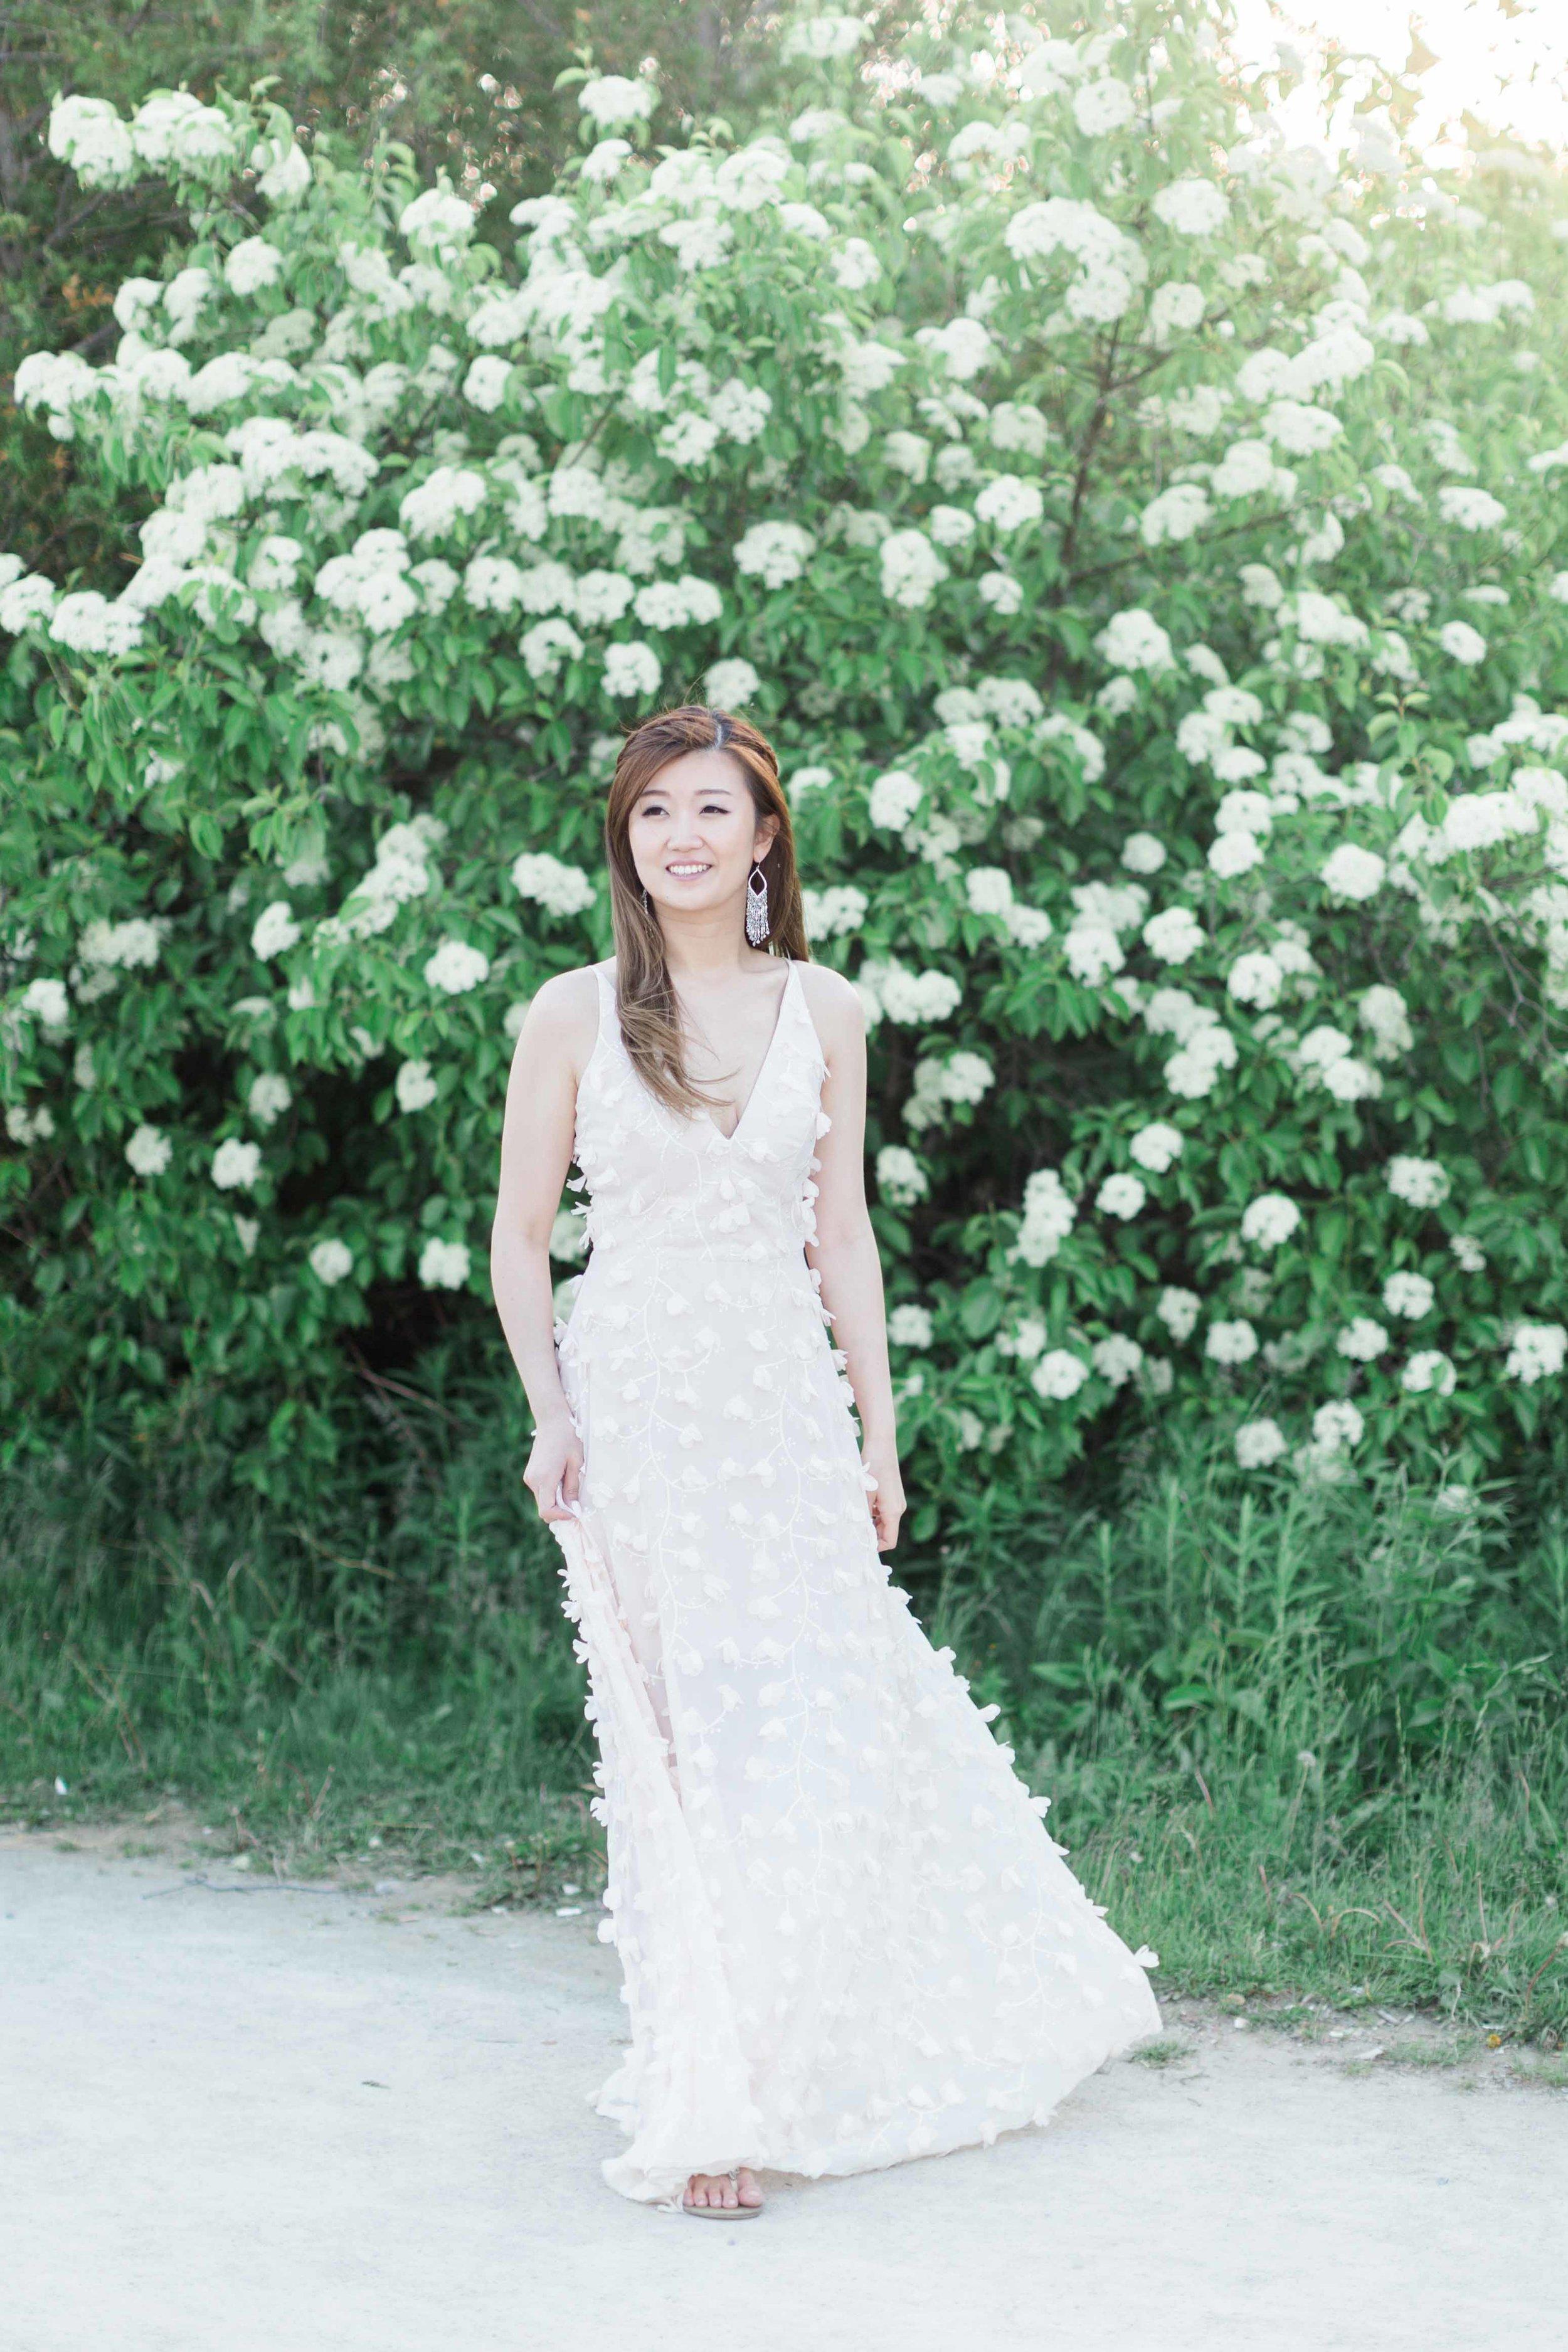 Cari Zhu Fine Art Photographer - Scarborough Bluffs Engagement Session-24.jpg